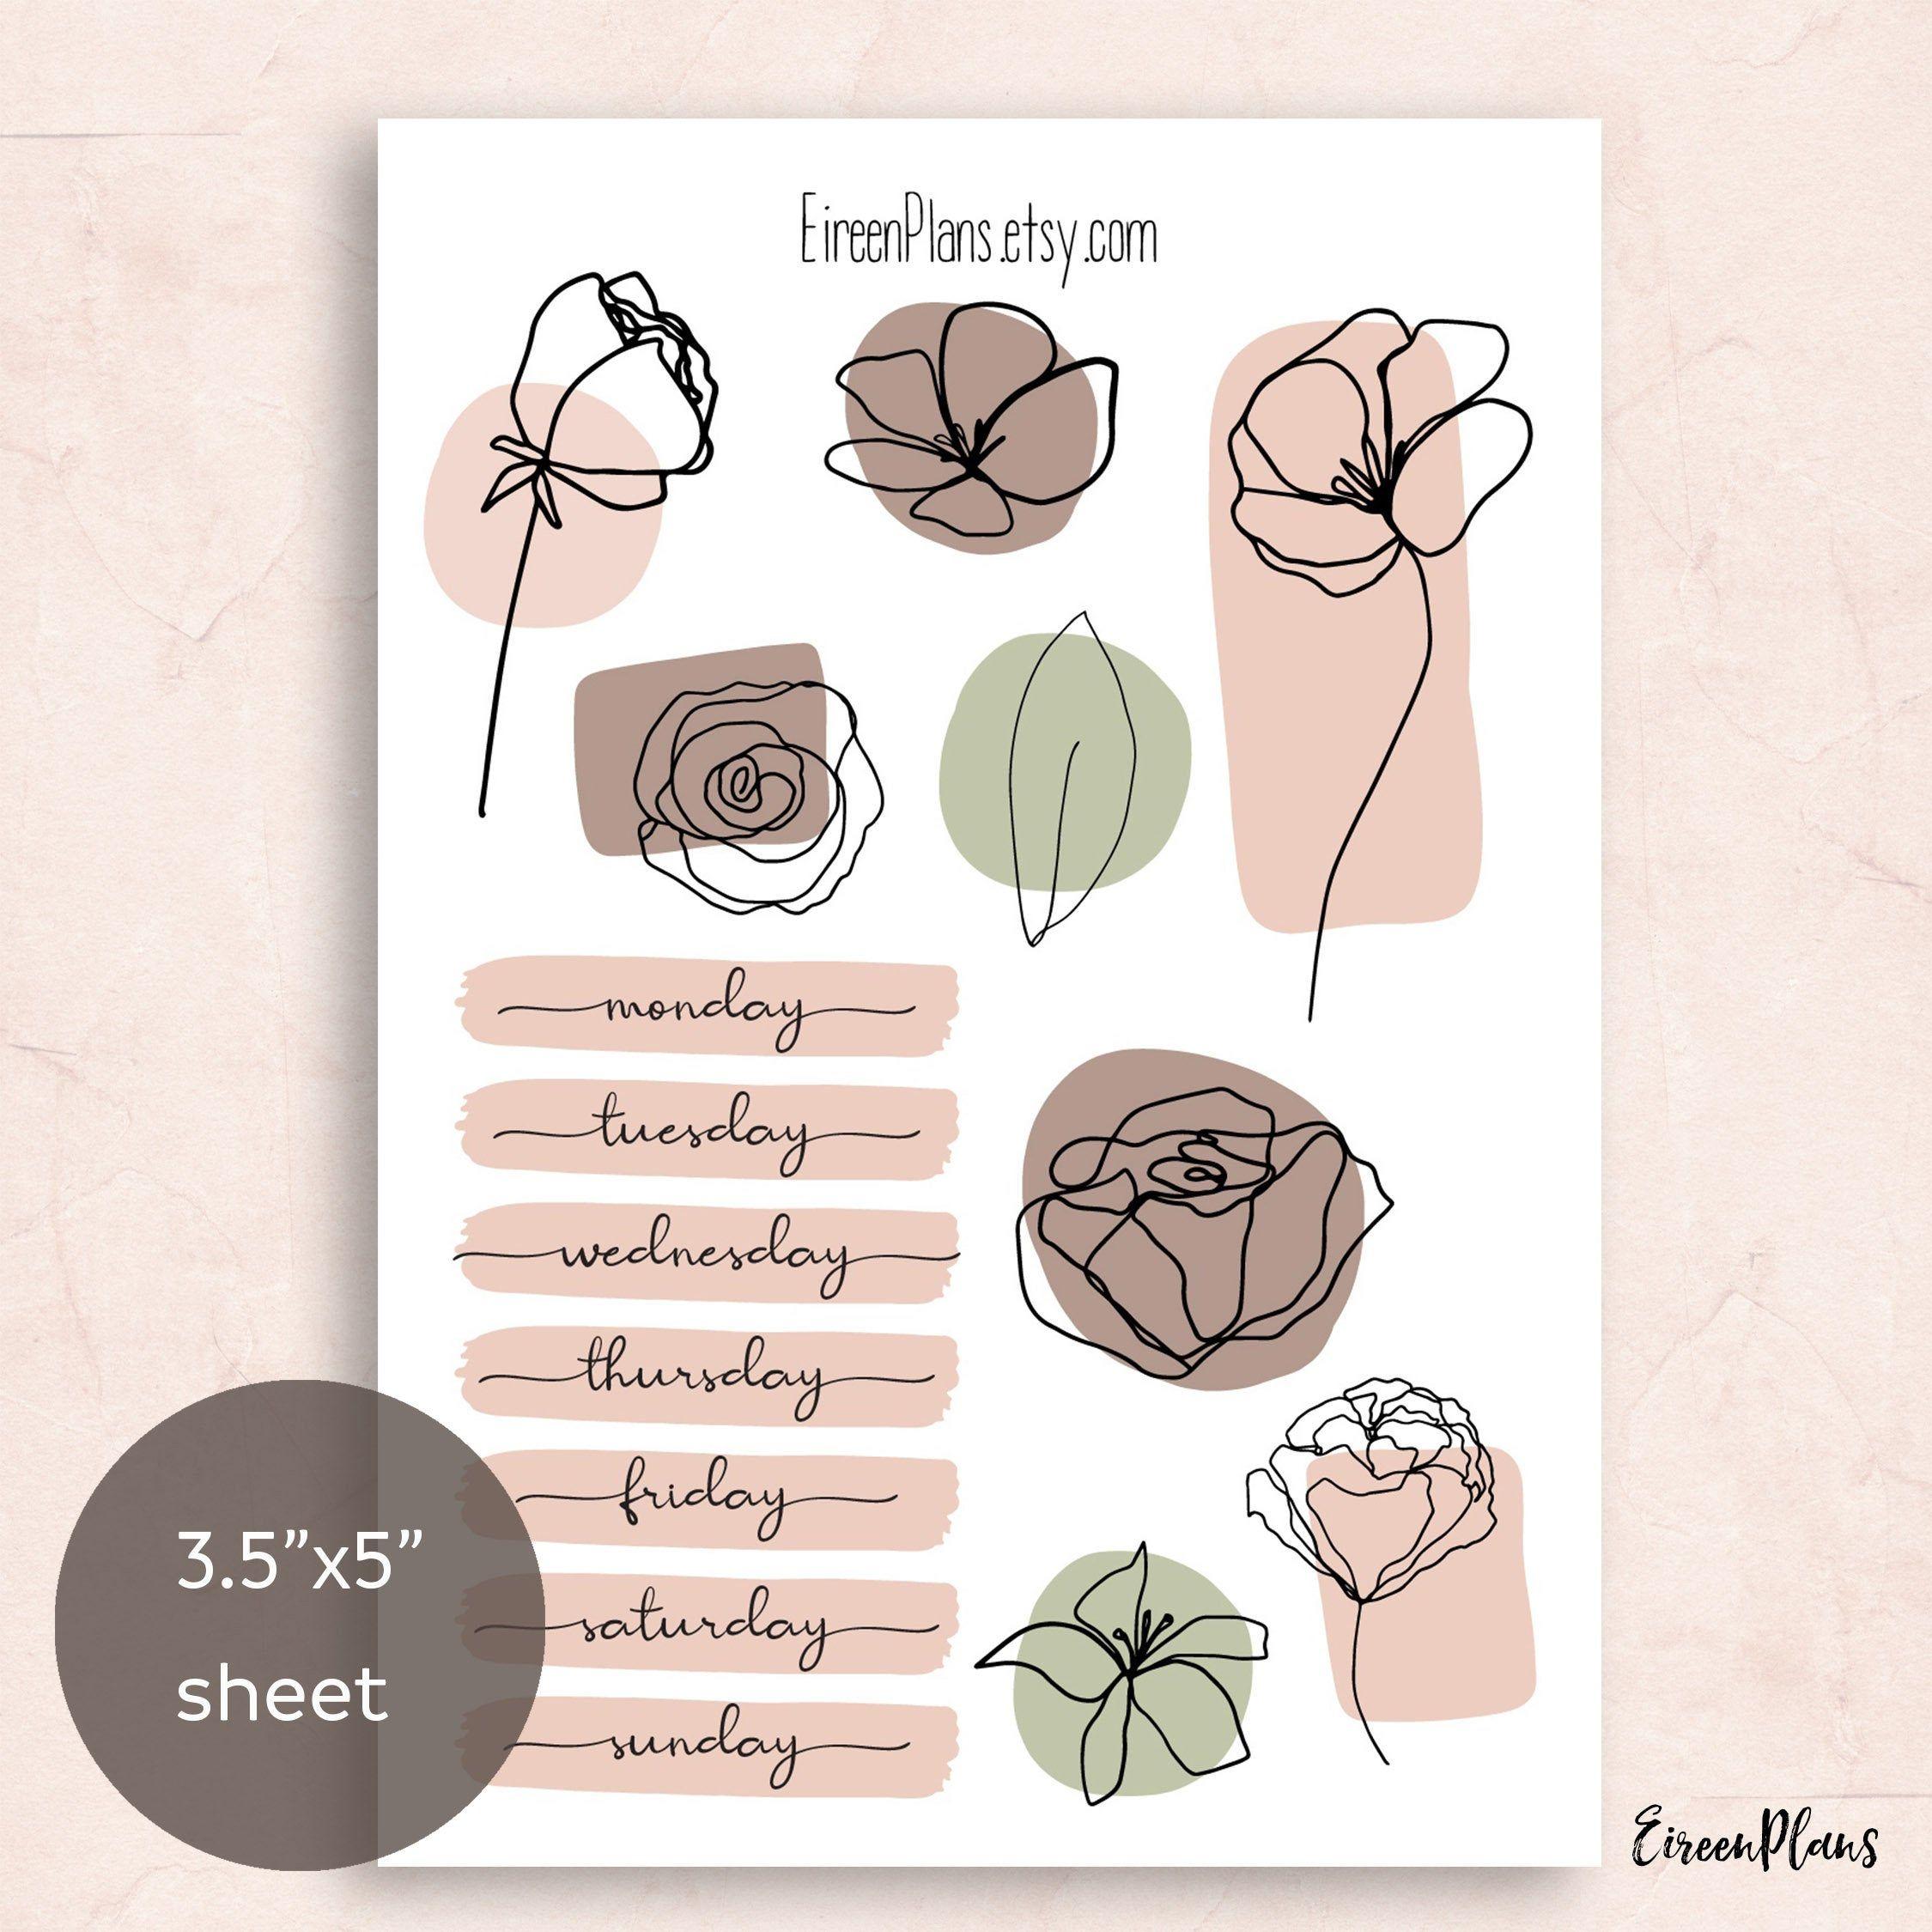 One Line Florals Planner Stickers, BuJo stickers, Journaling Stickers, Bullet Journal Planner Stickers, Mini Weekly Kit, Weekdays, Spring